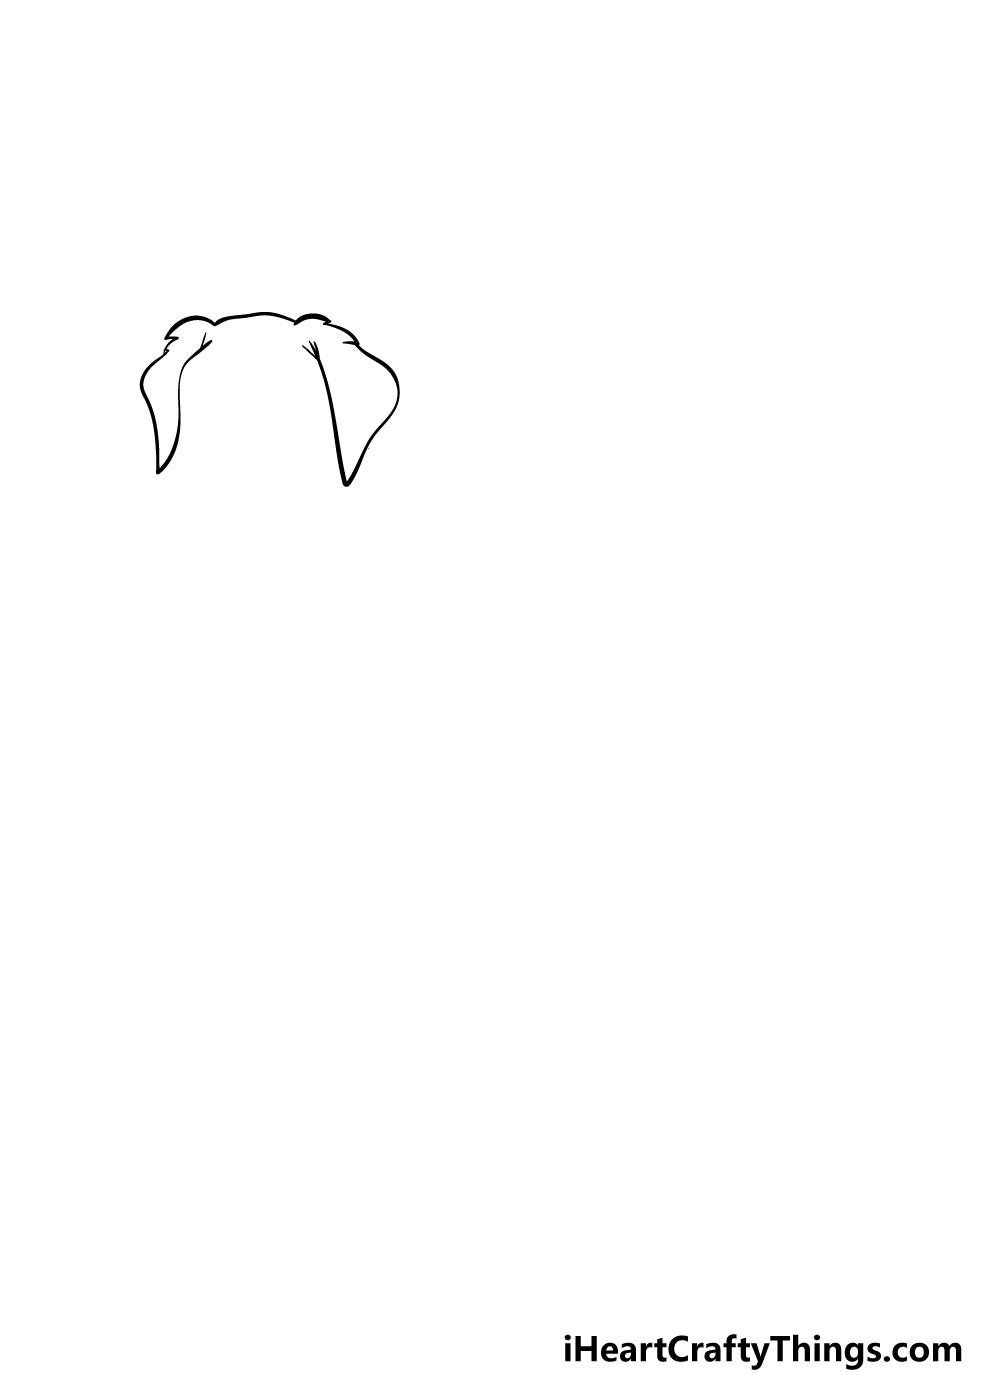 golden retriever drawing step 1